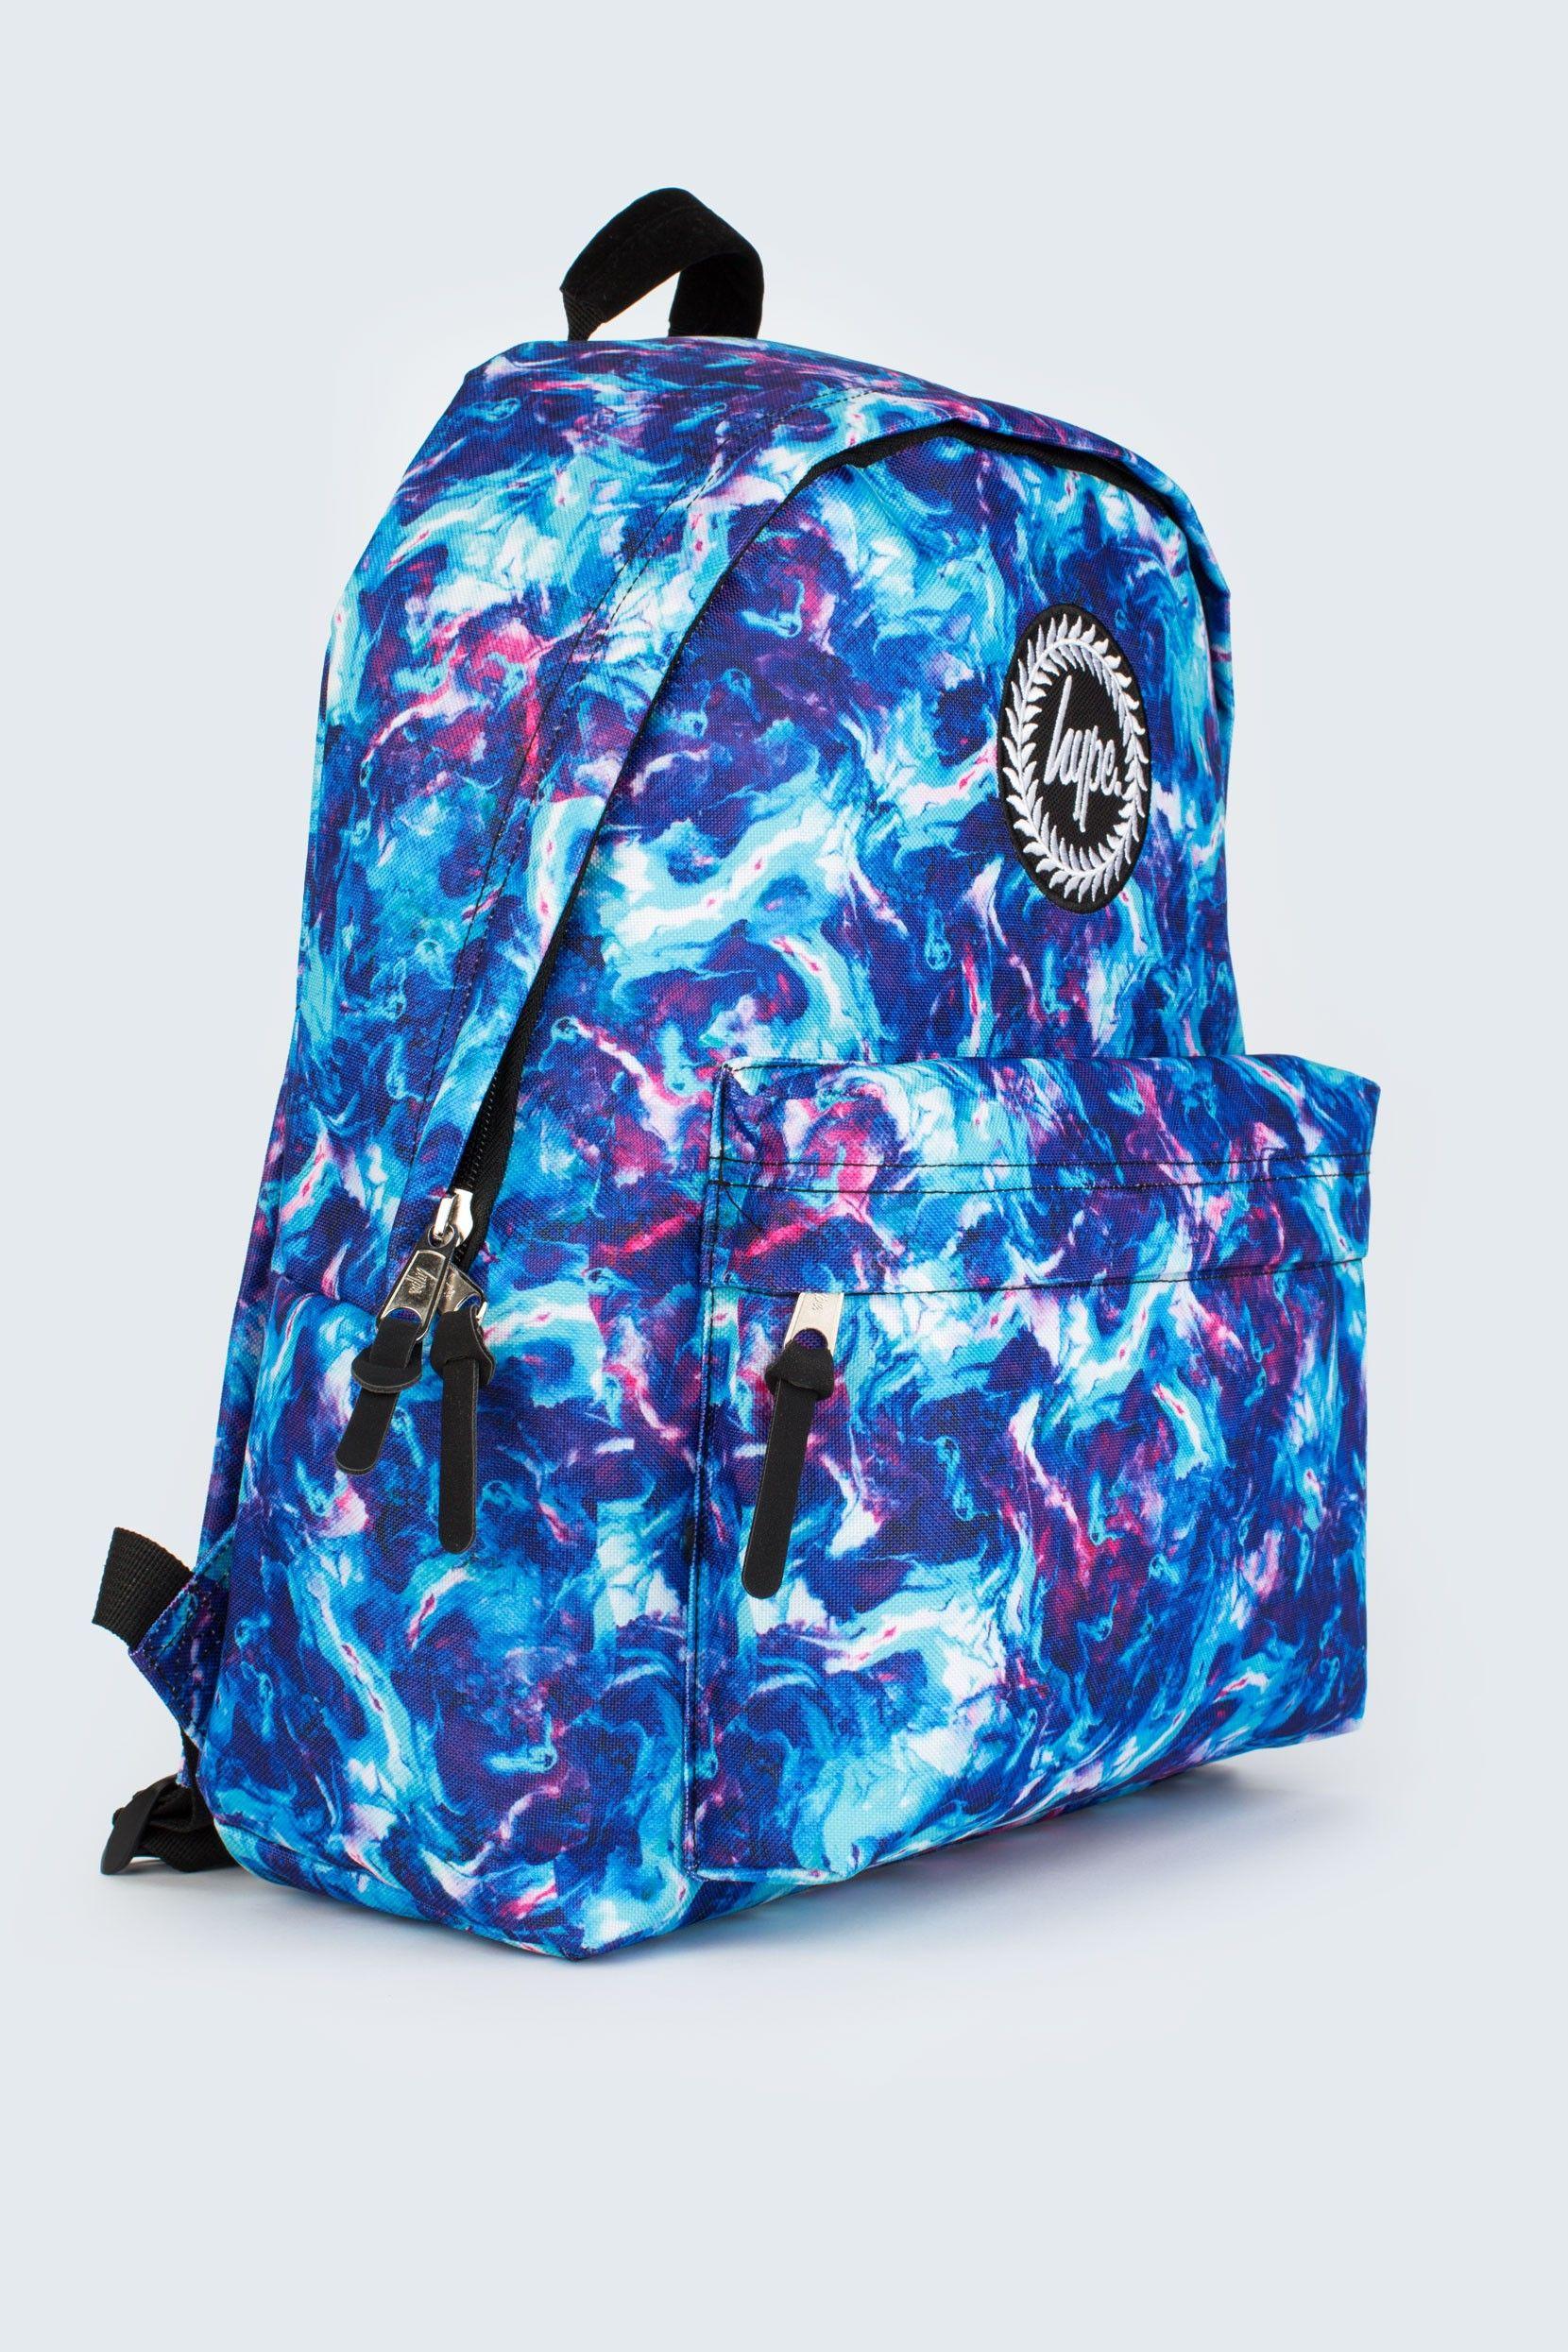 HYPE THUNDER BACKPACK - Bags - HYPE®  bc4b22772ac56